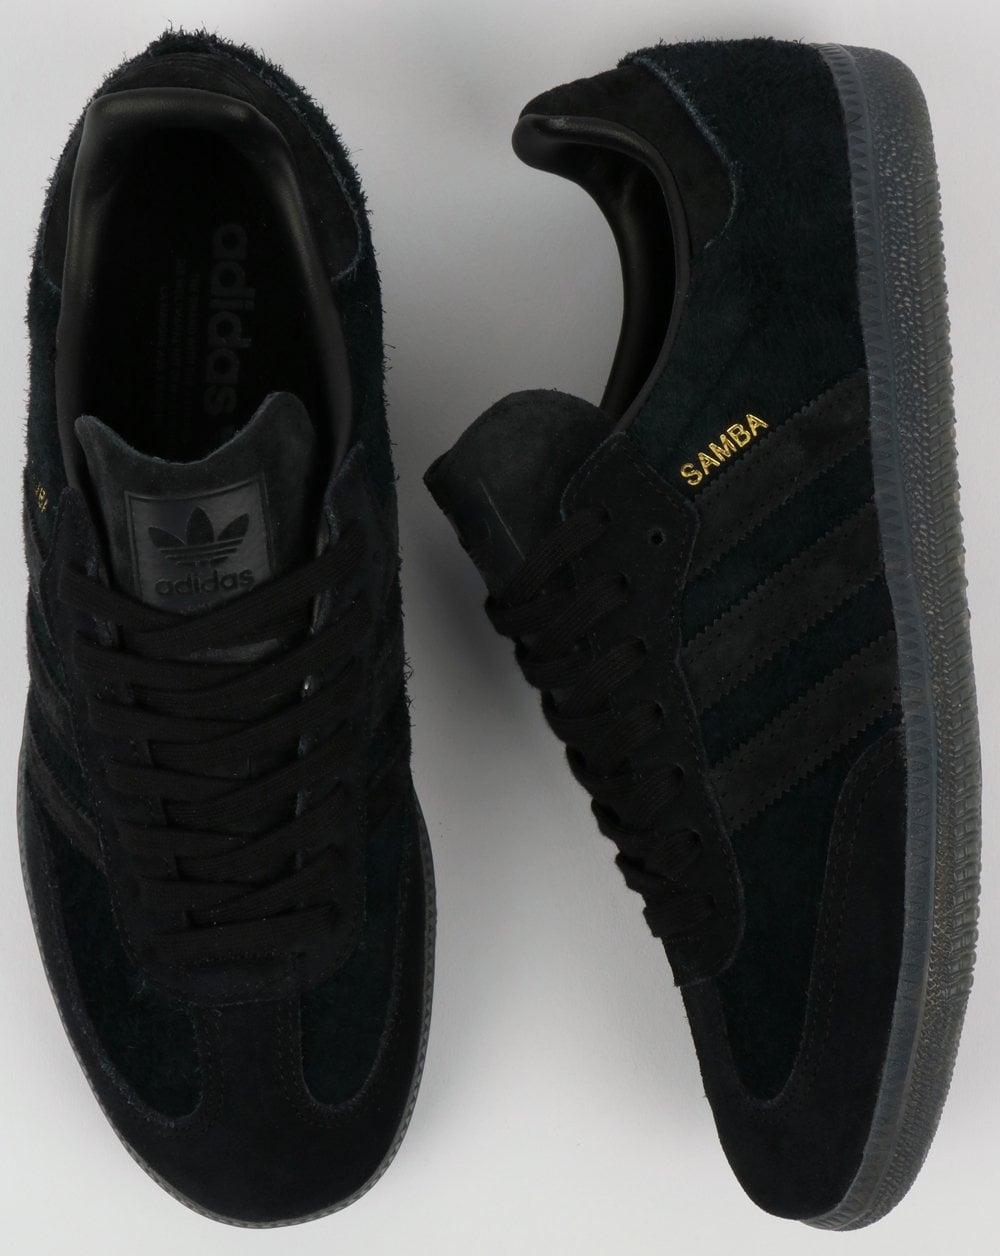 Adidas Samba Trainers Black,suede,OG